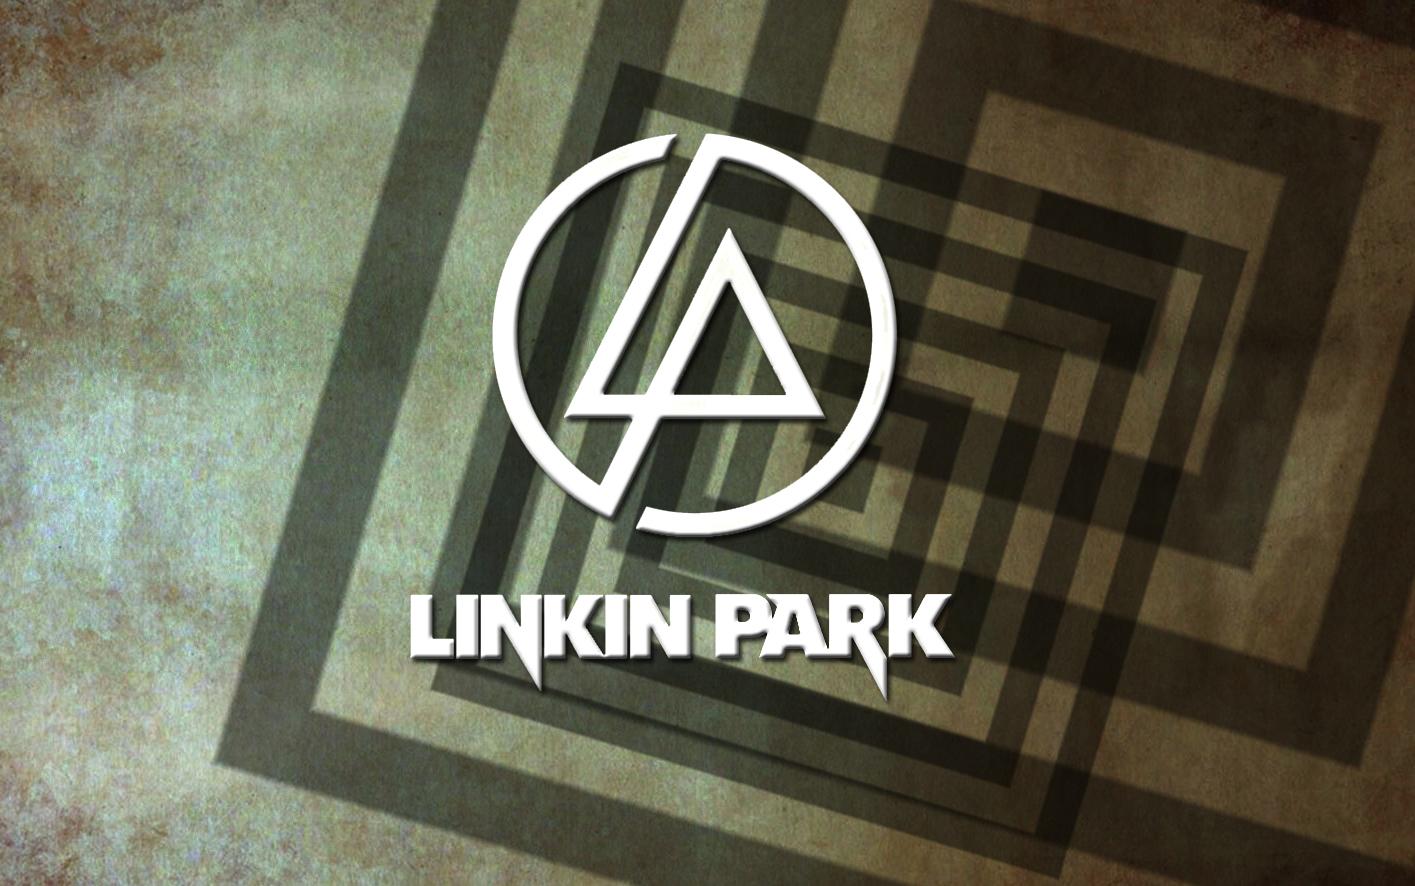 Linkin Park New Promo Album Wallpaper 610 Wallpaper Wallpaper 1415x886